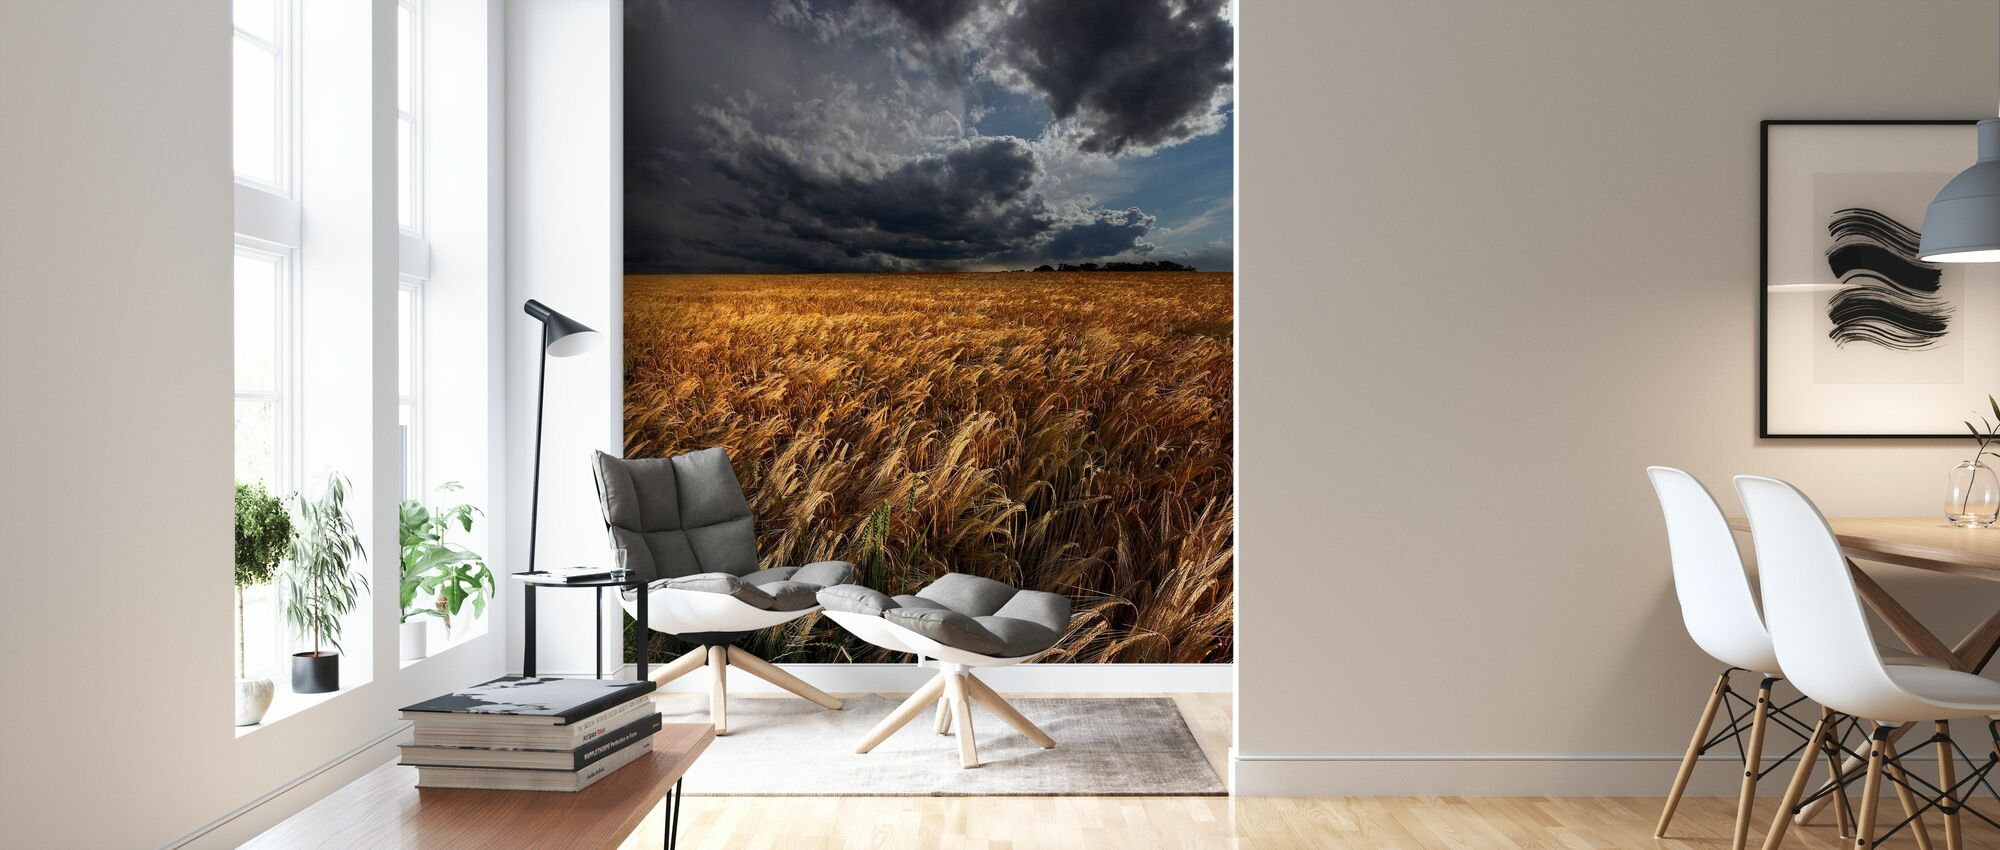 Worried Sky - Wallpaper - Living Room